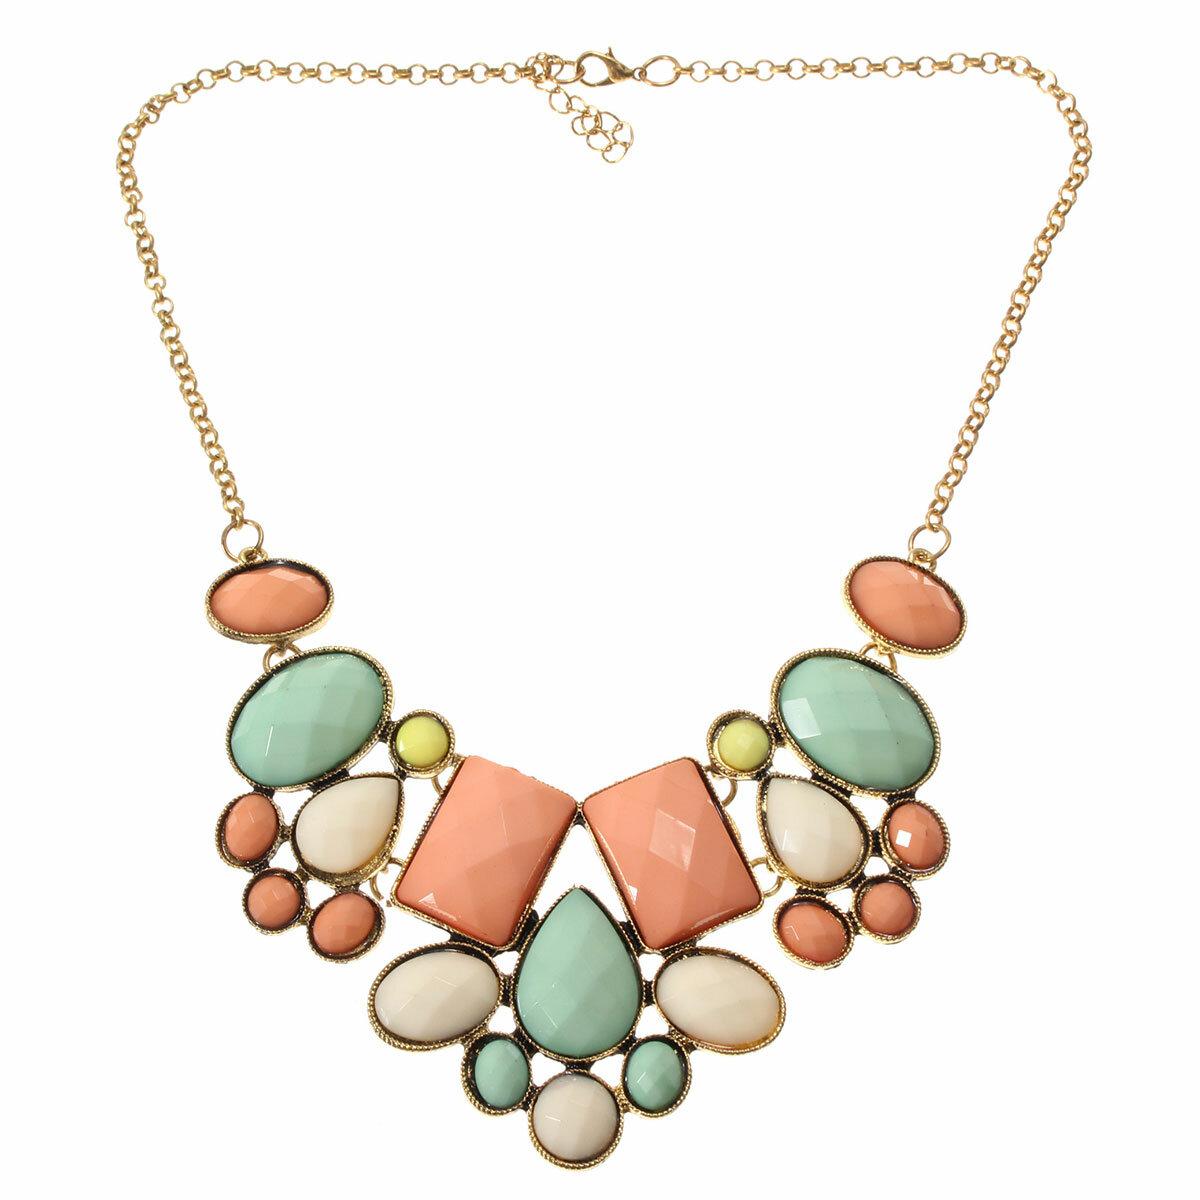 Vintage Crystal Alloy Necklace